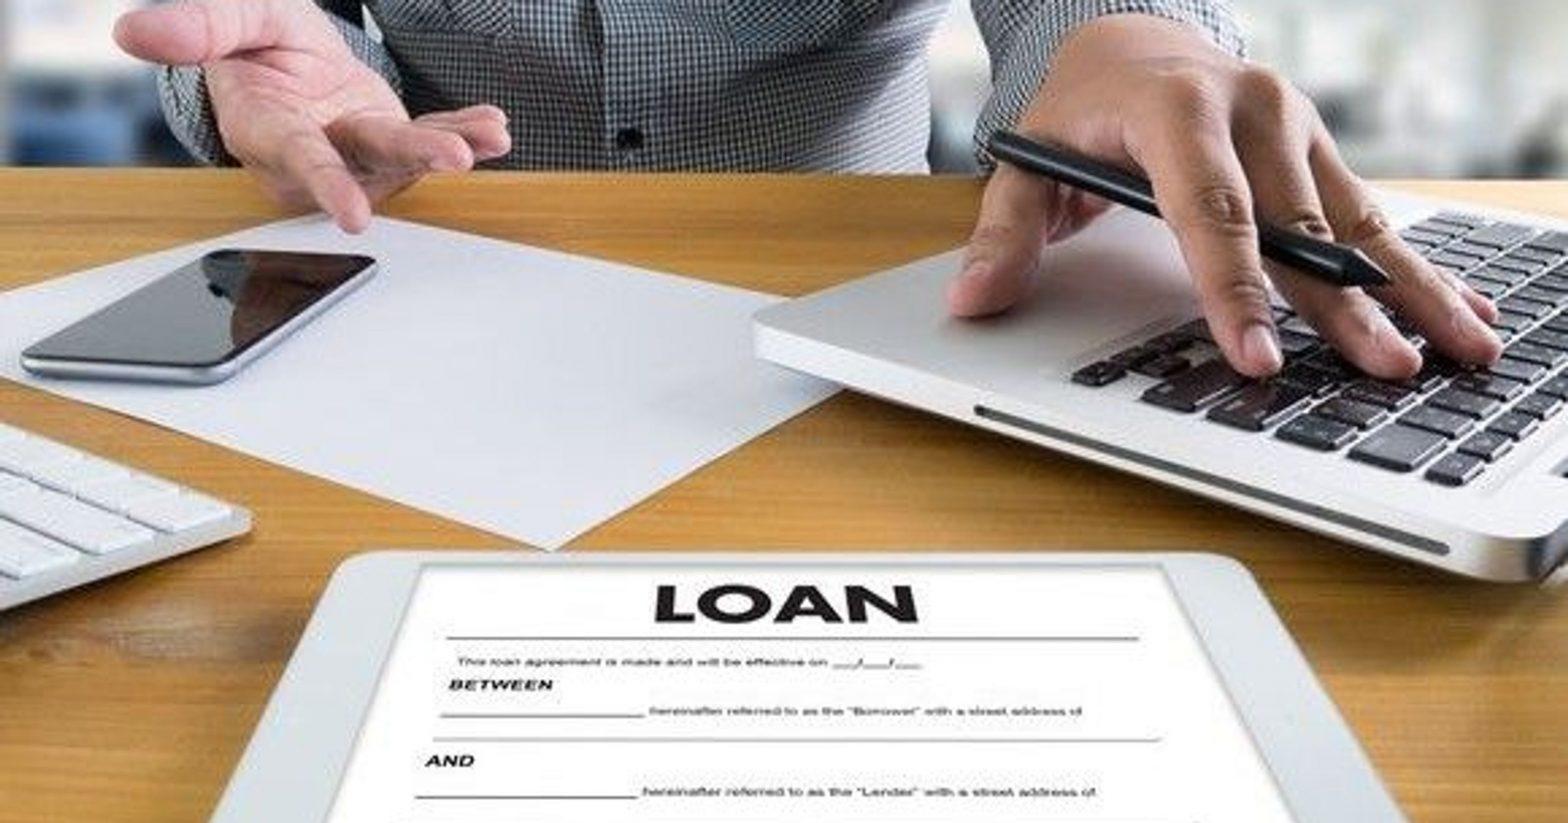 Myinstantoffer-Pre-Approval-Personal-Loan-By-Lending-Club